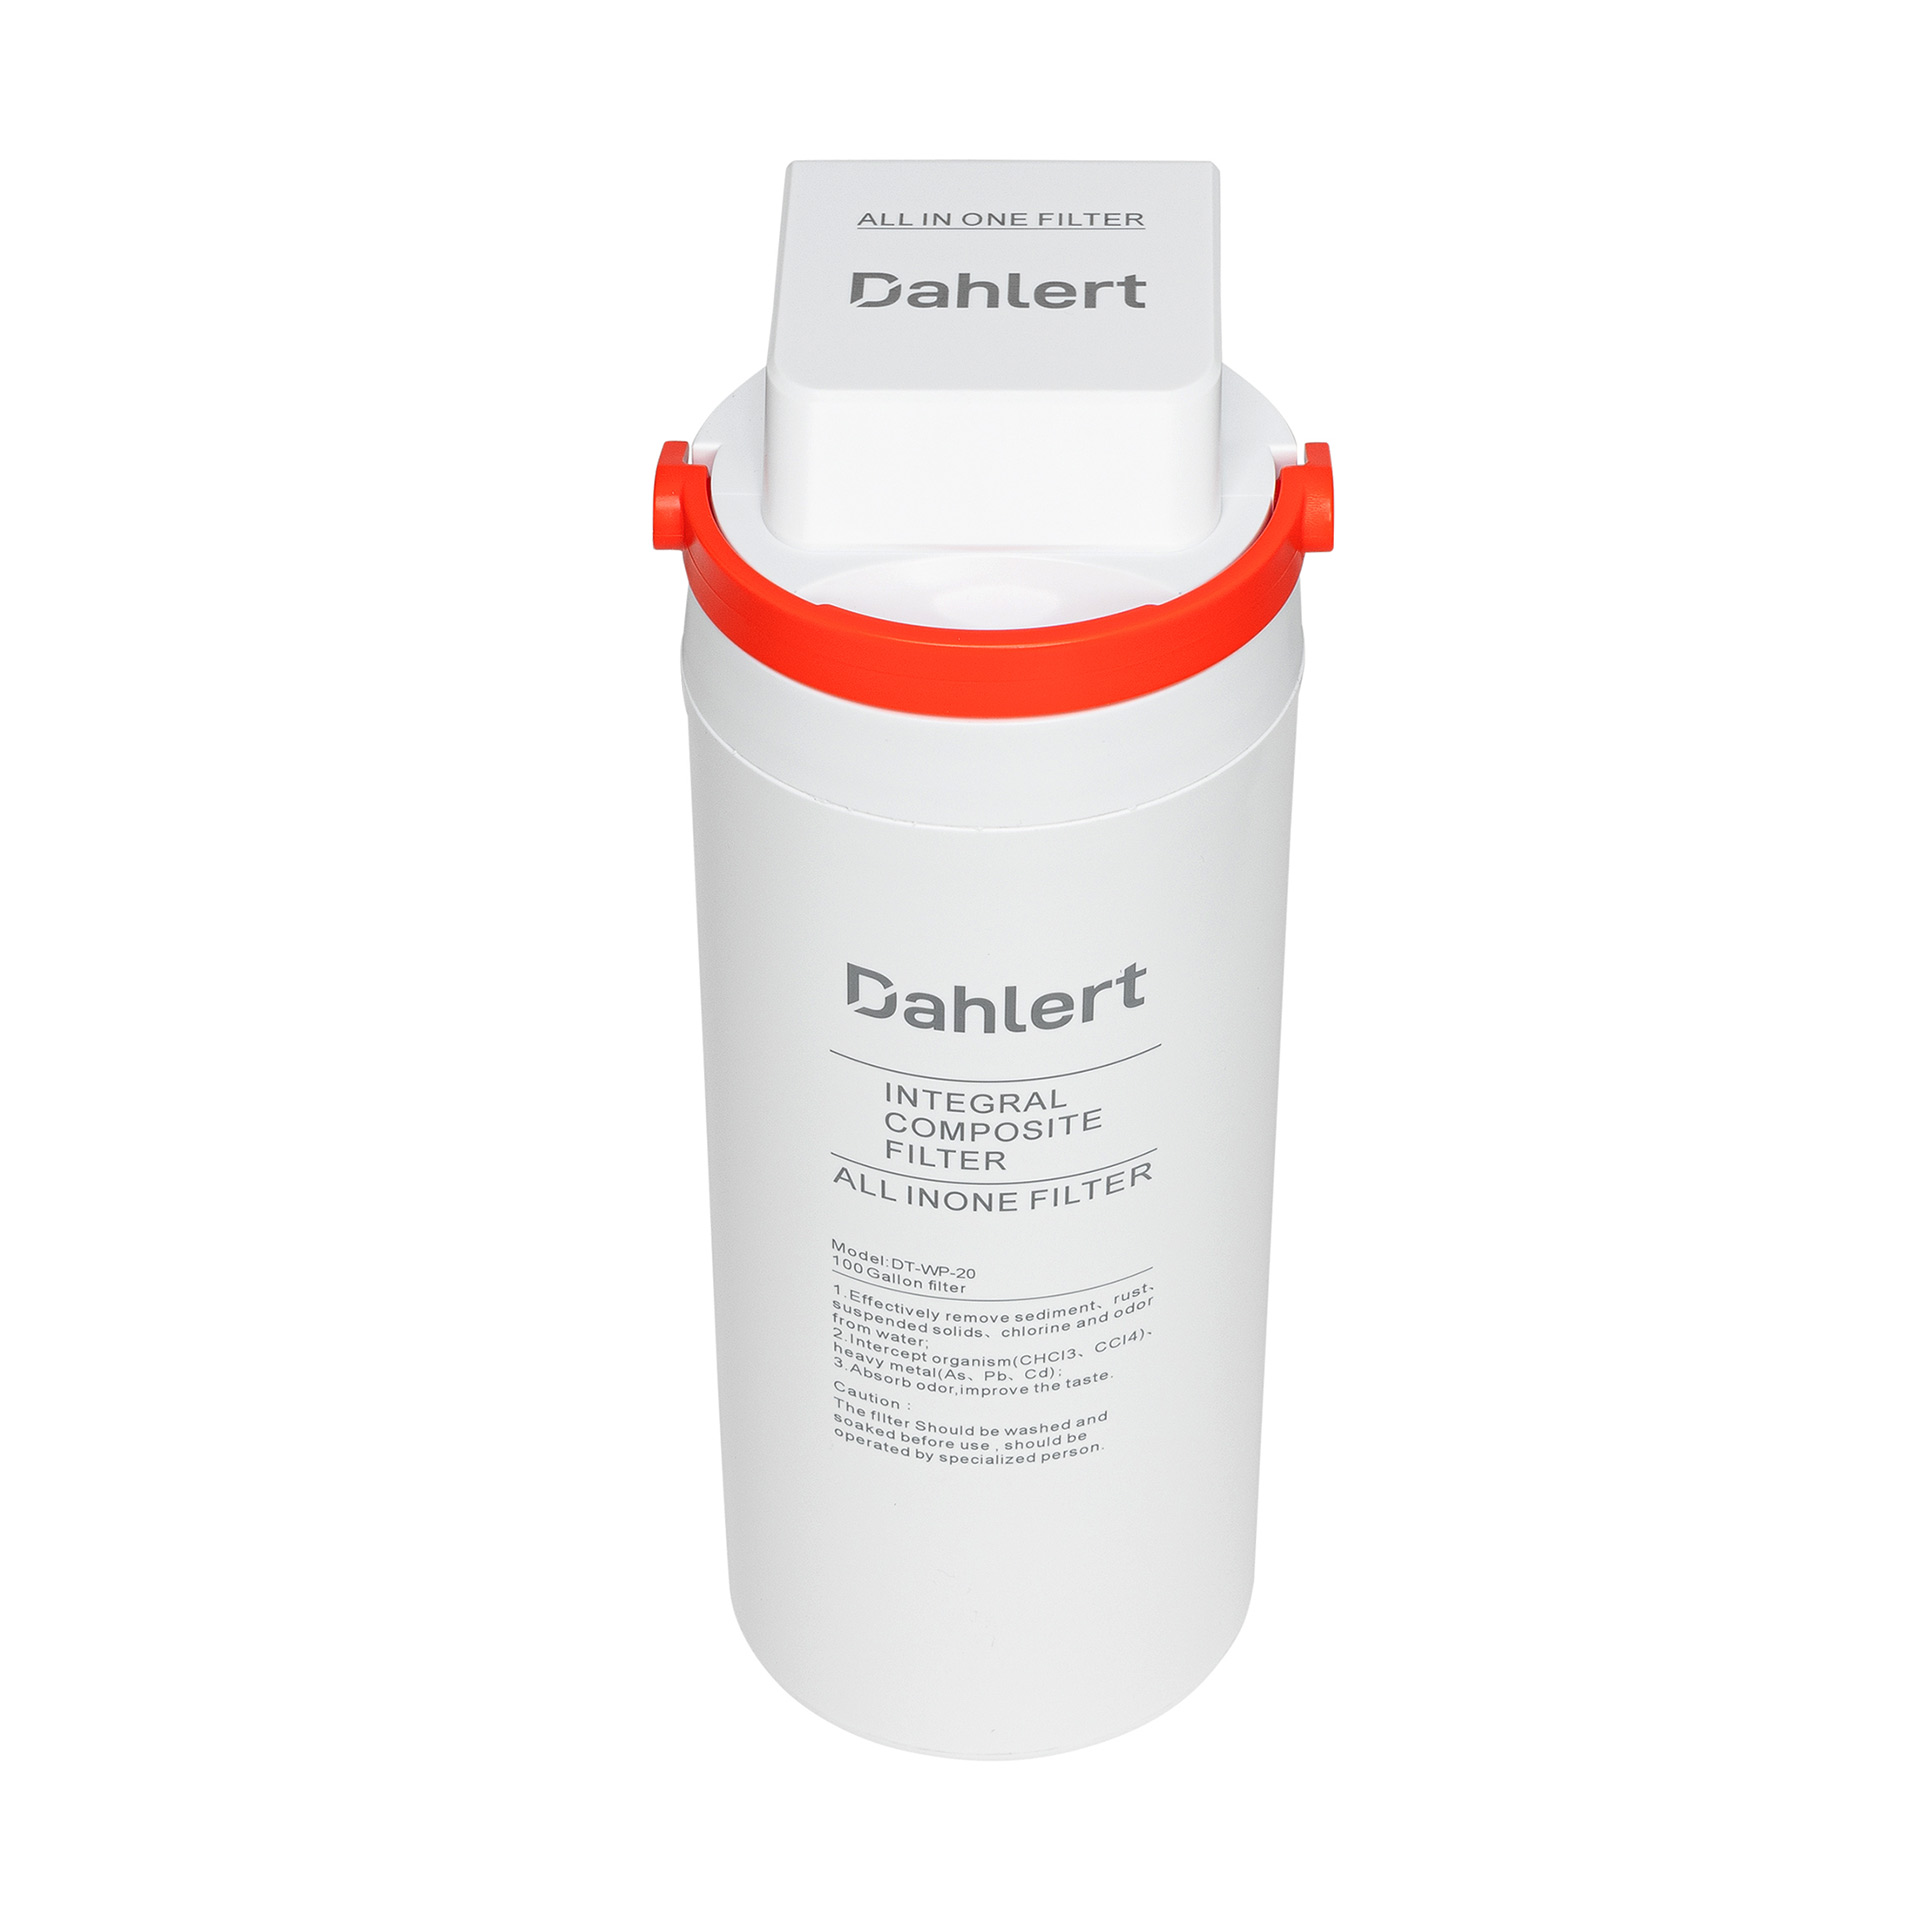 Dahlert Wasserfilter Filtereinsatz